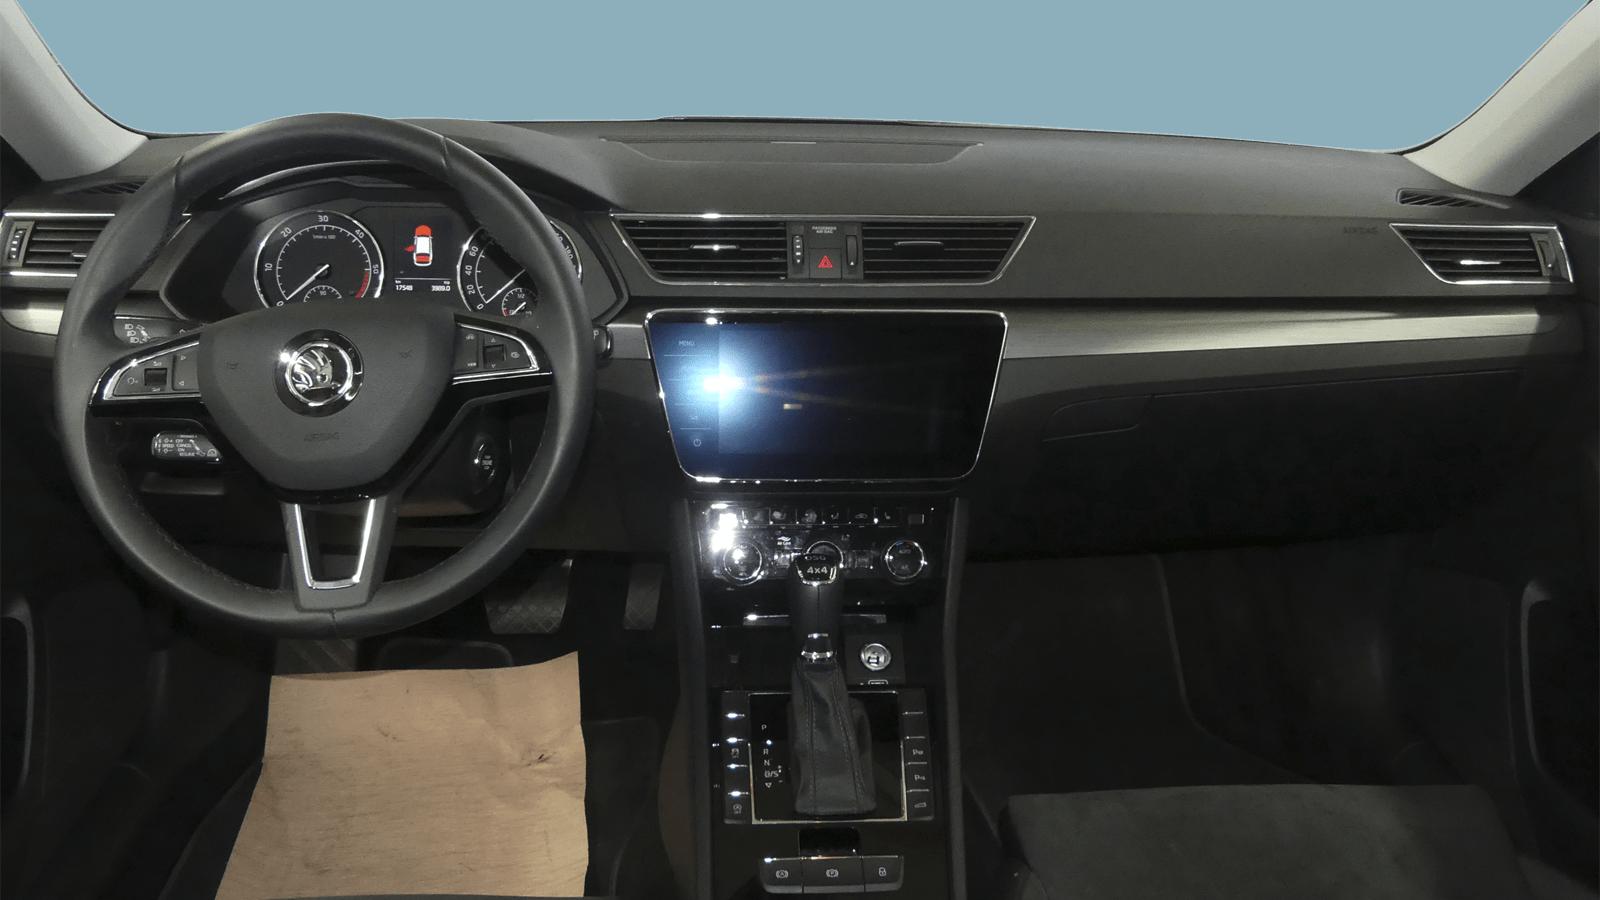 ŠKODA Superb Black interior - Clyde car subscription